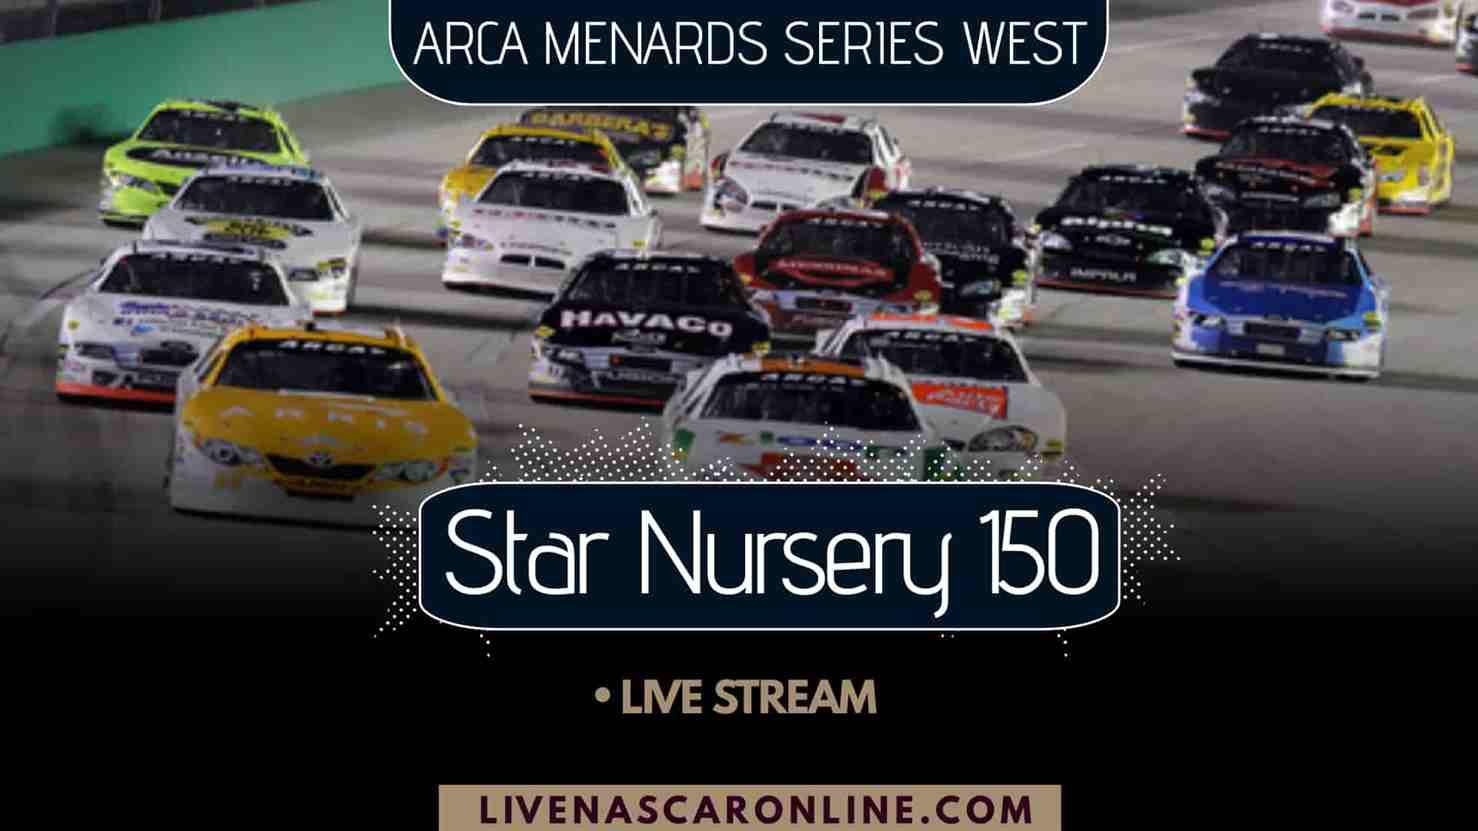 Star Nursery 150 ARCA Menards Series Live Stream